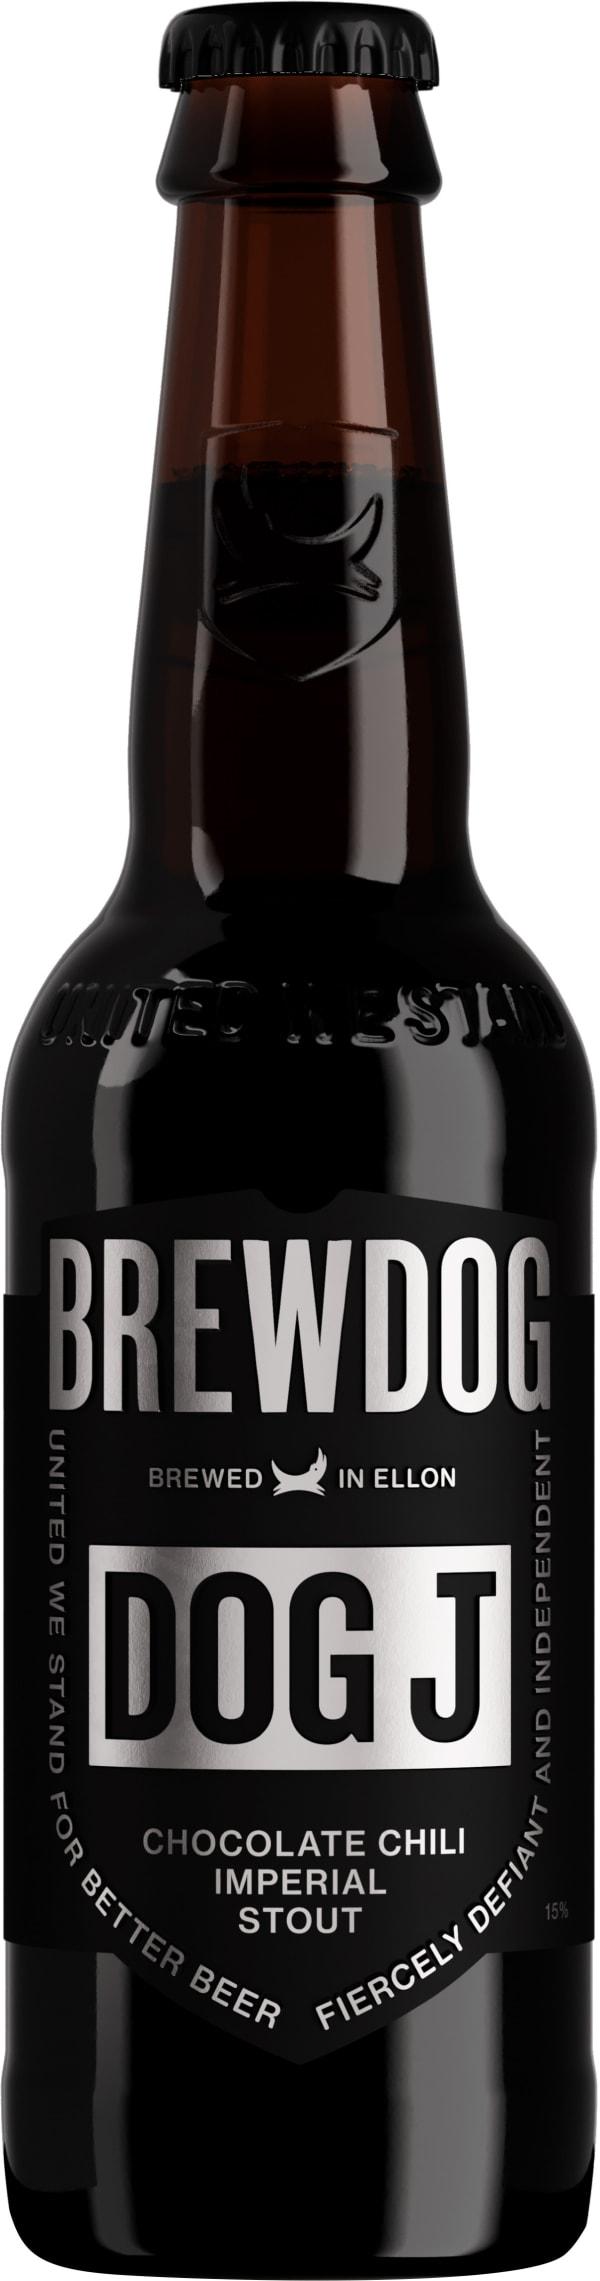 BrewDog Dog J